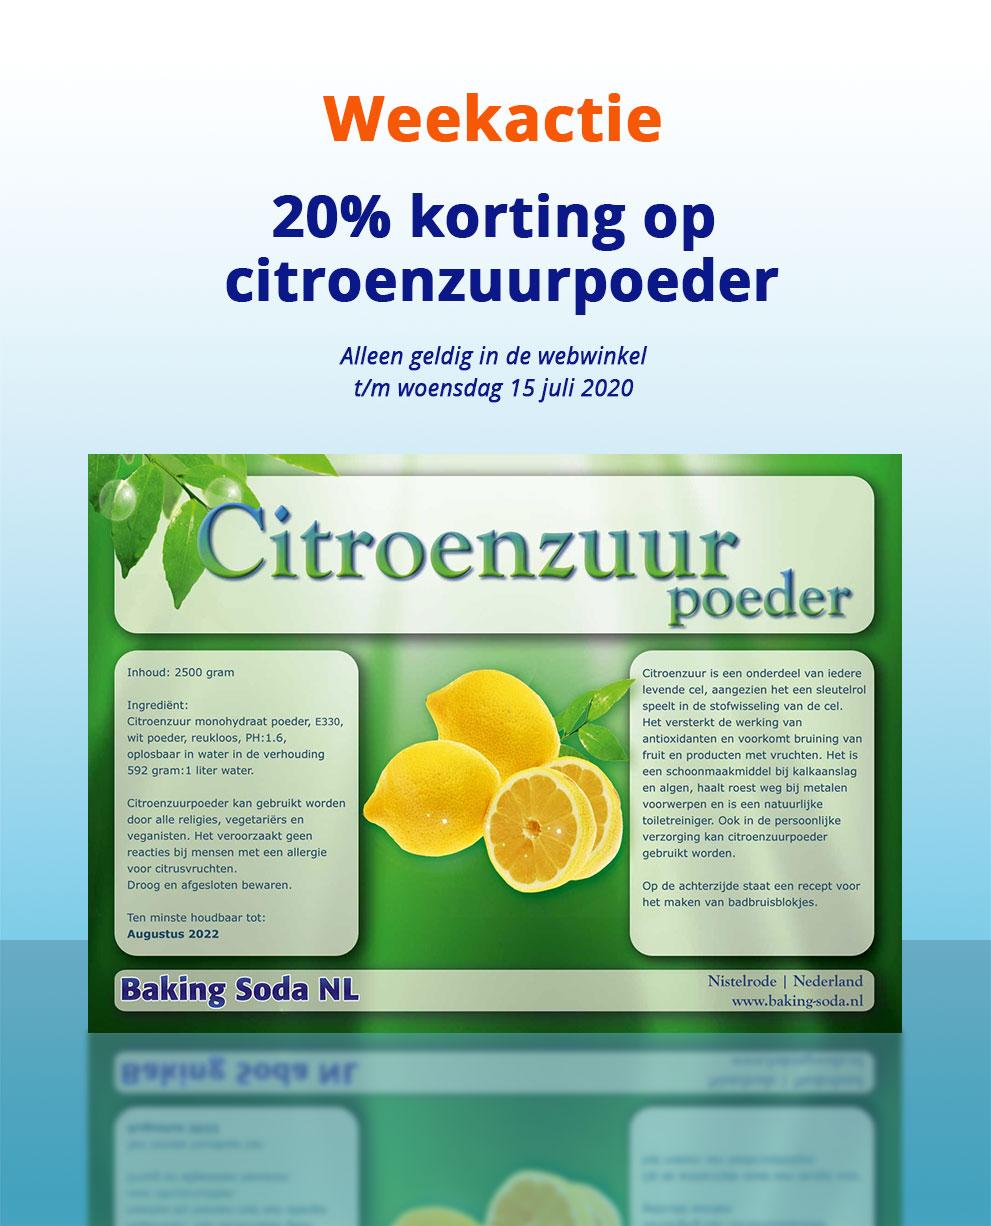 Weekactie-citroenzuurpoeder-juli2020-bakingsoda-nl